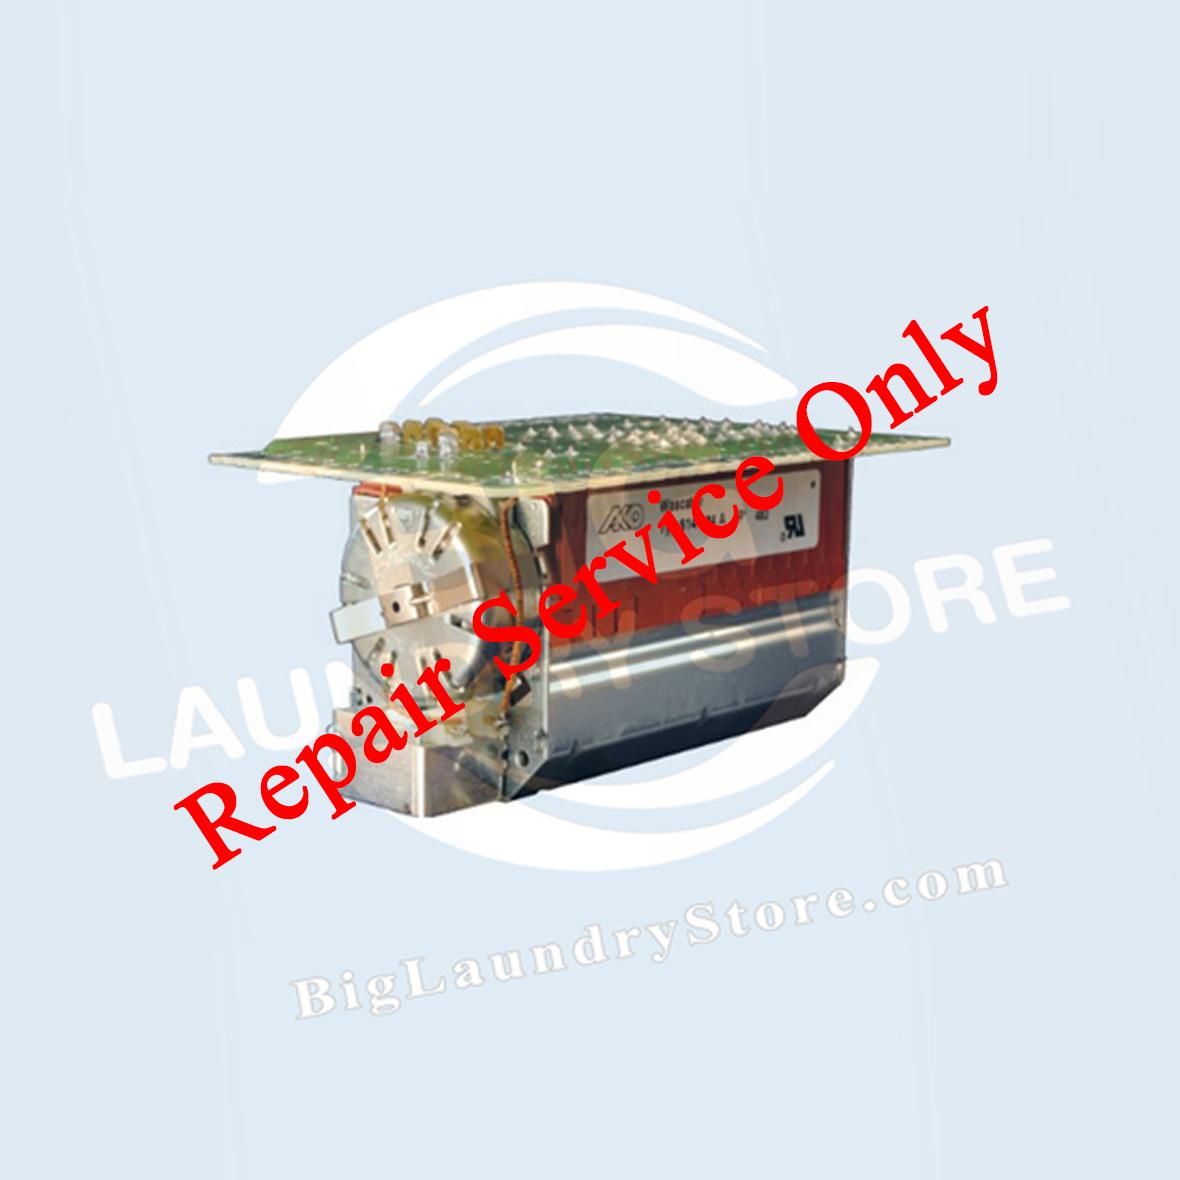 REPAIR - Wascomat Generation 6 220V/60Hz Timer # 898102, 897802 Repair